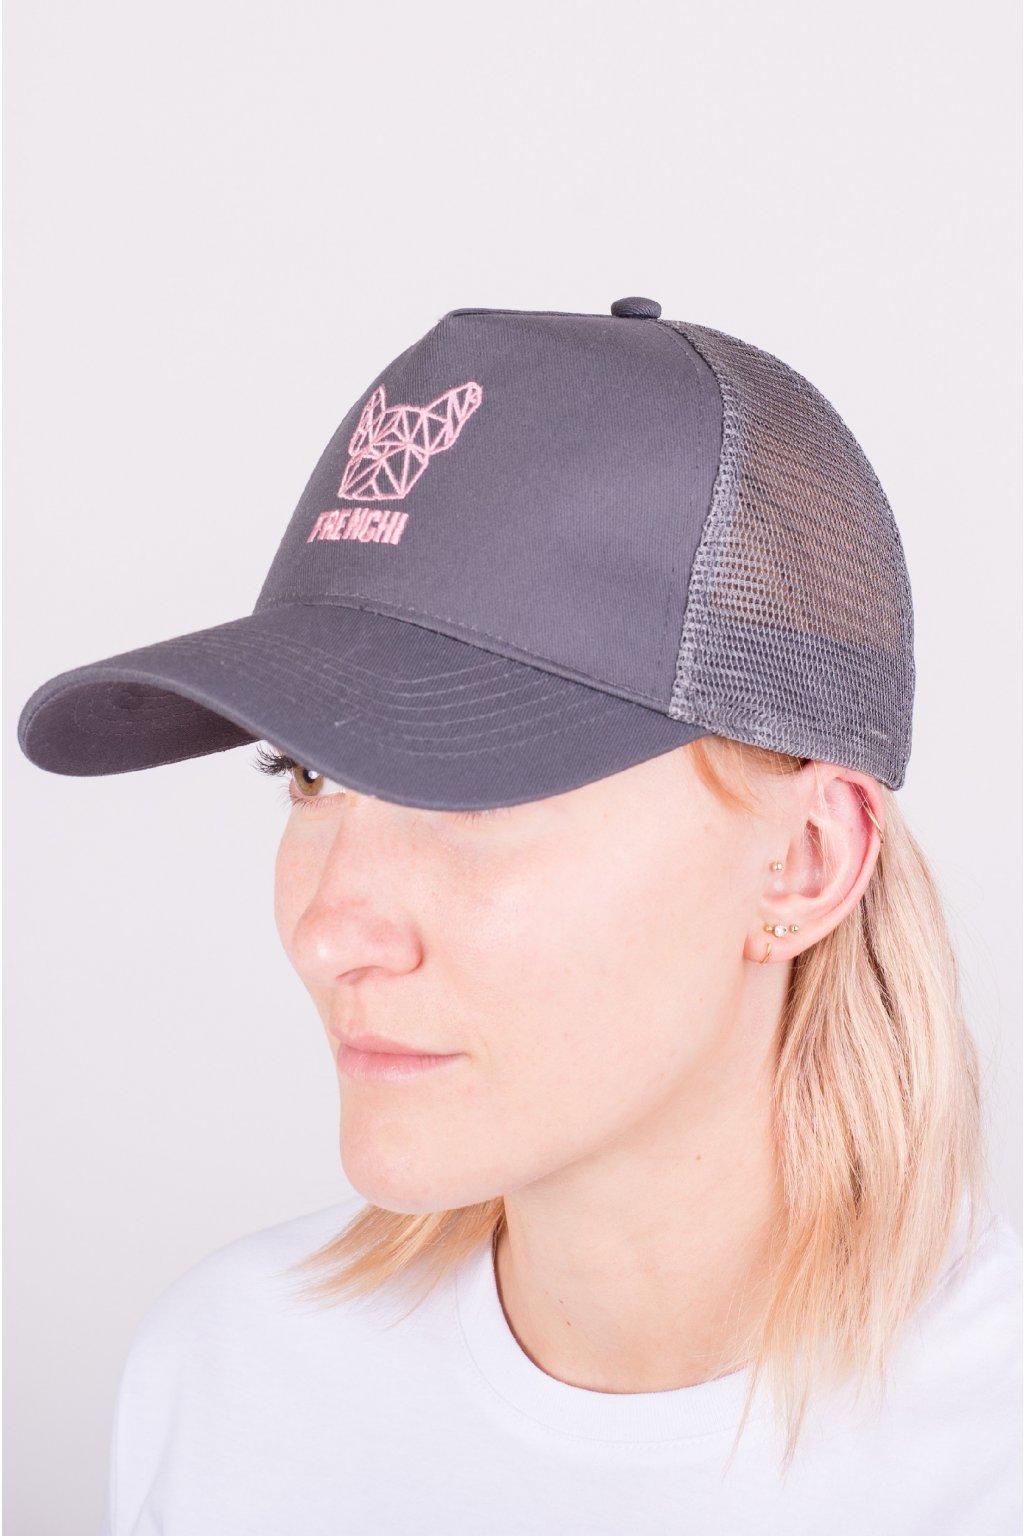 Kšiltovka Trucker se síťovinou šedá + růžové logo